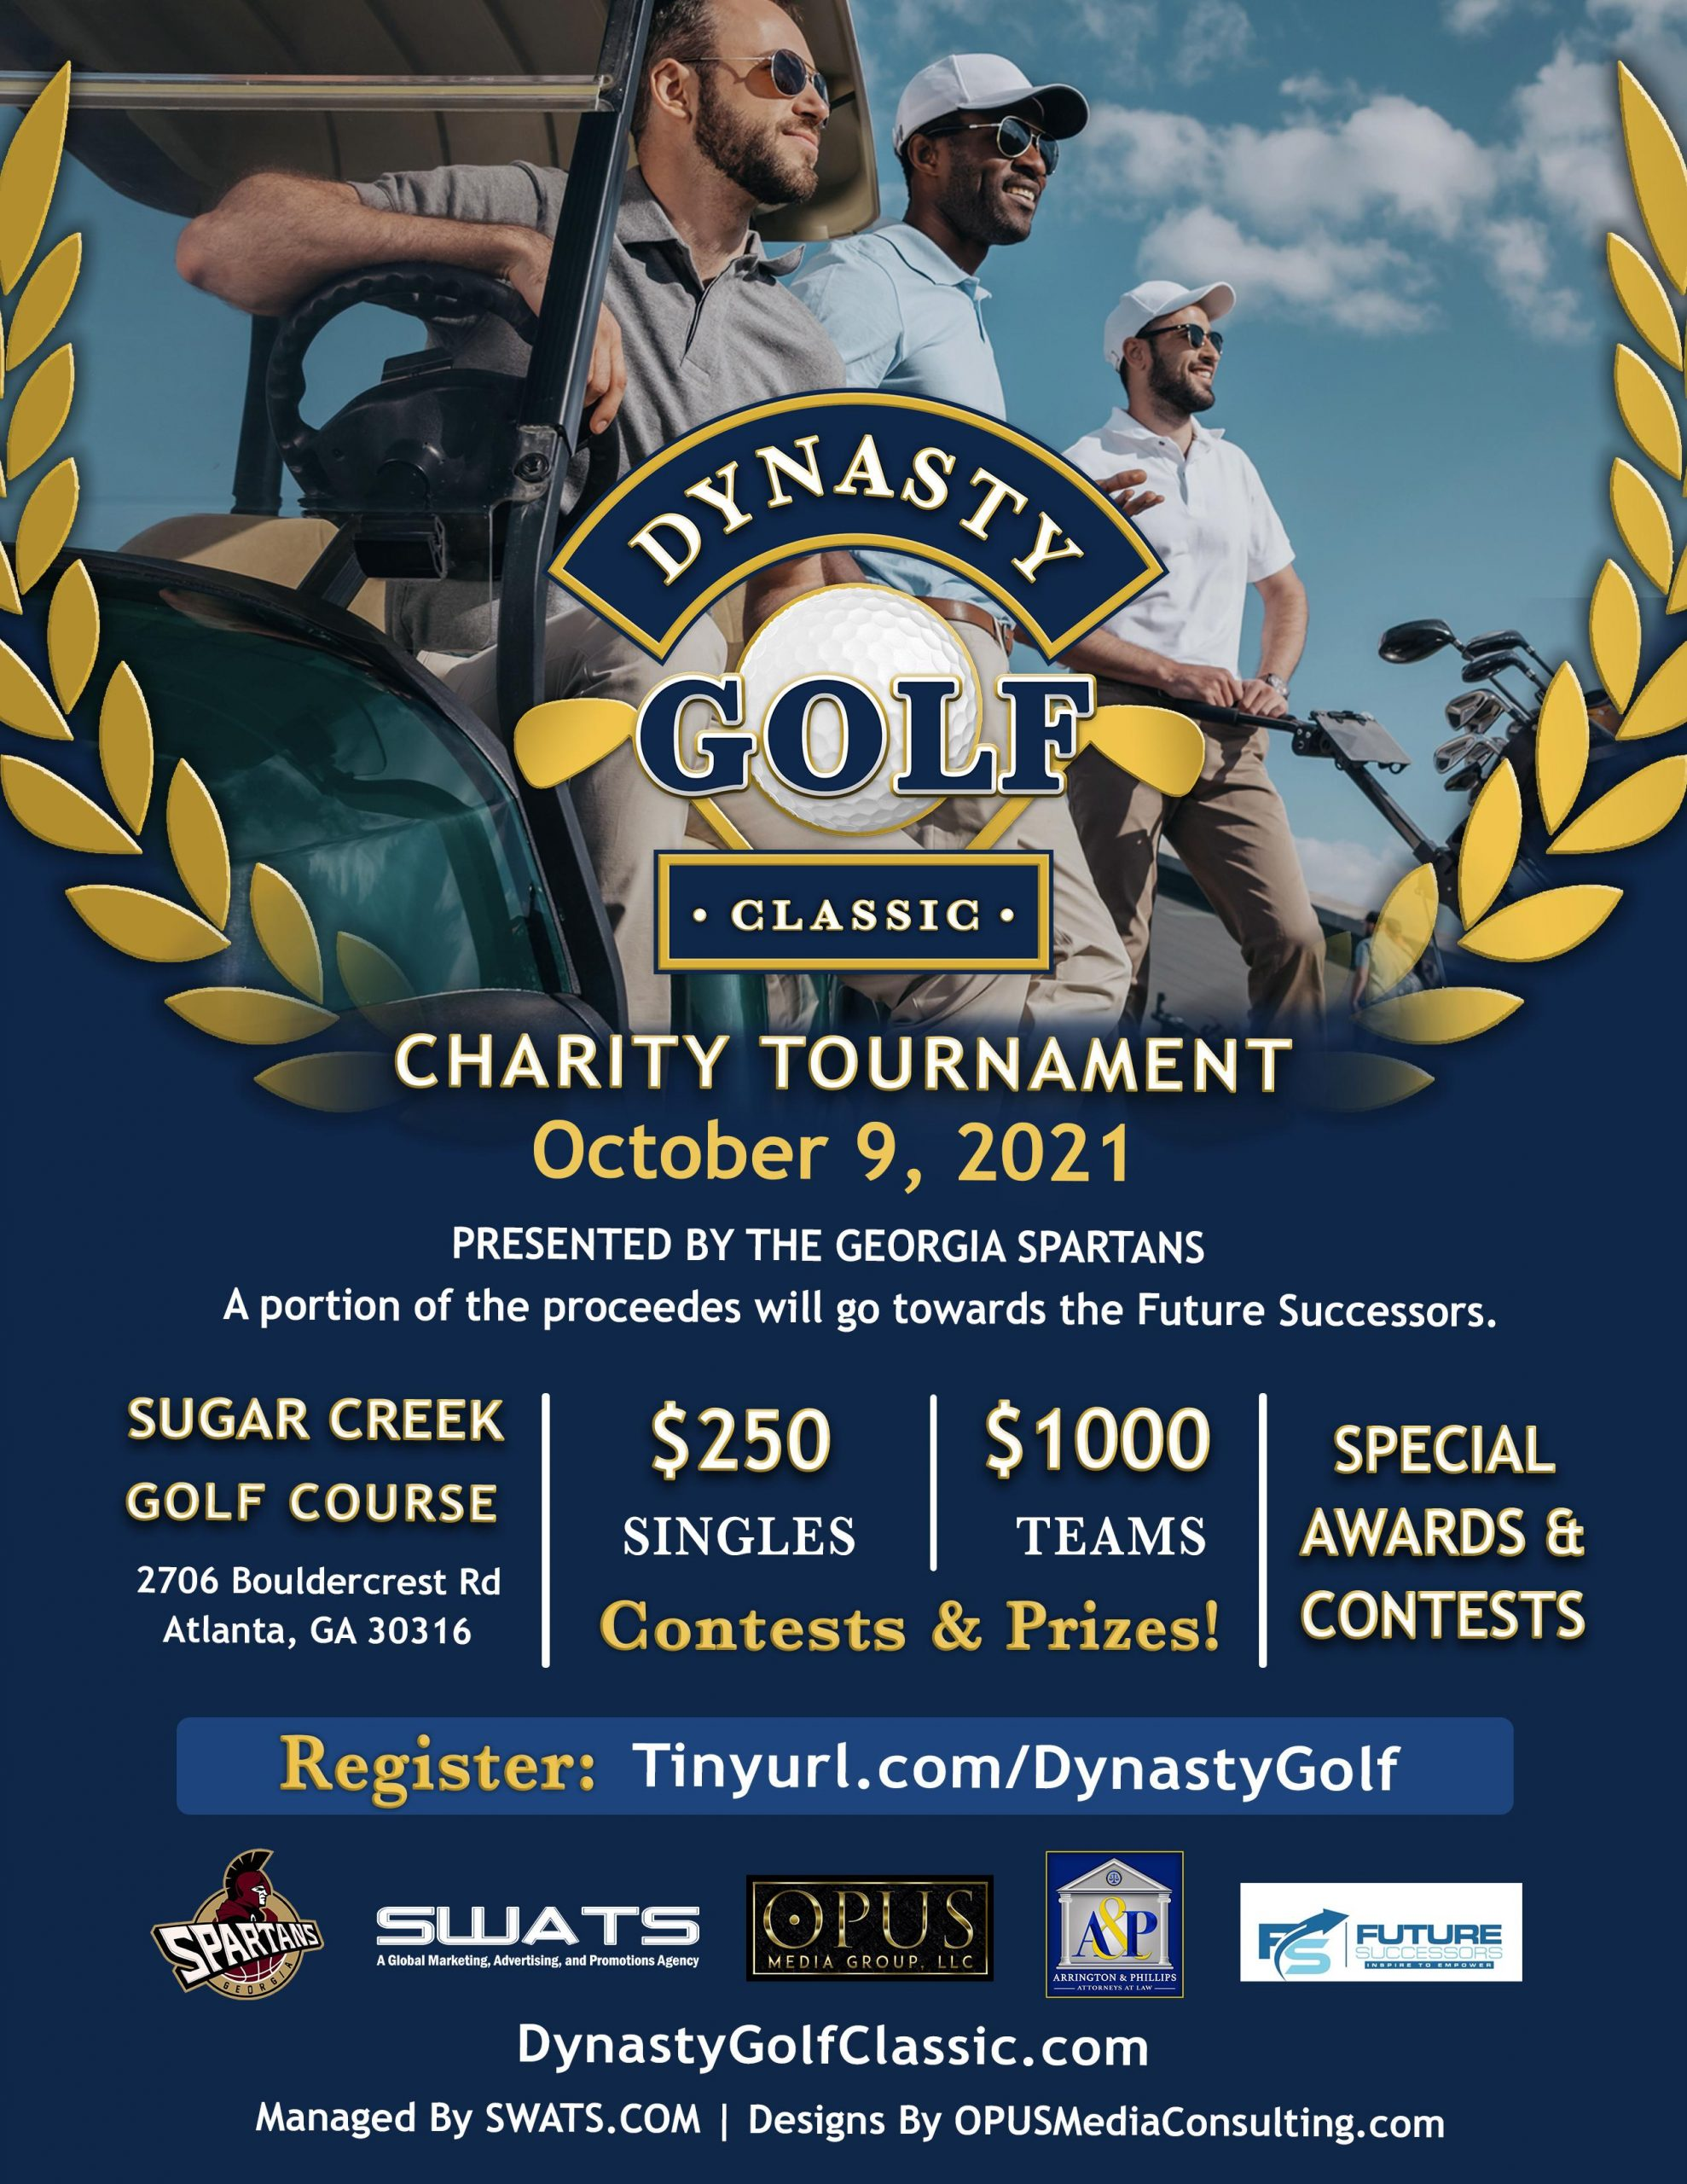 Dynasty Golf Classic Tournament